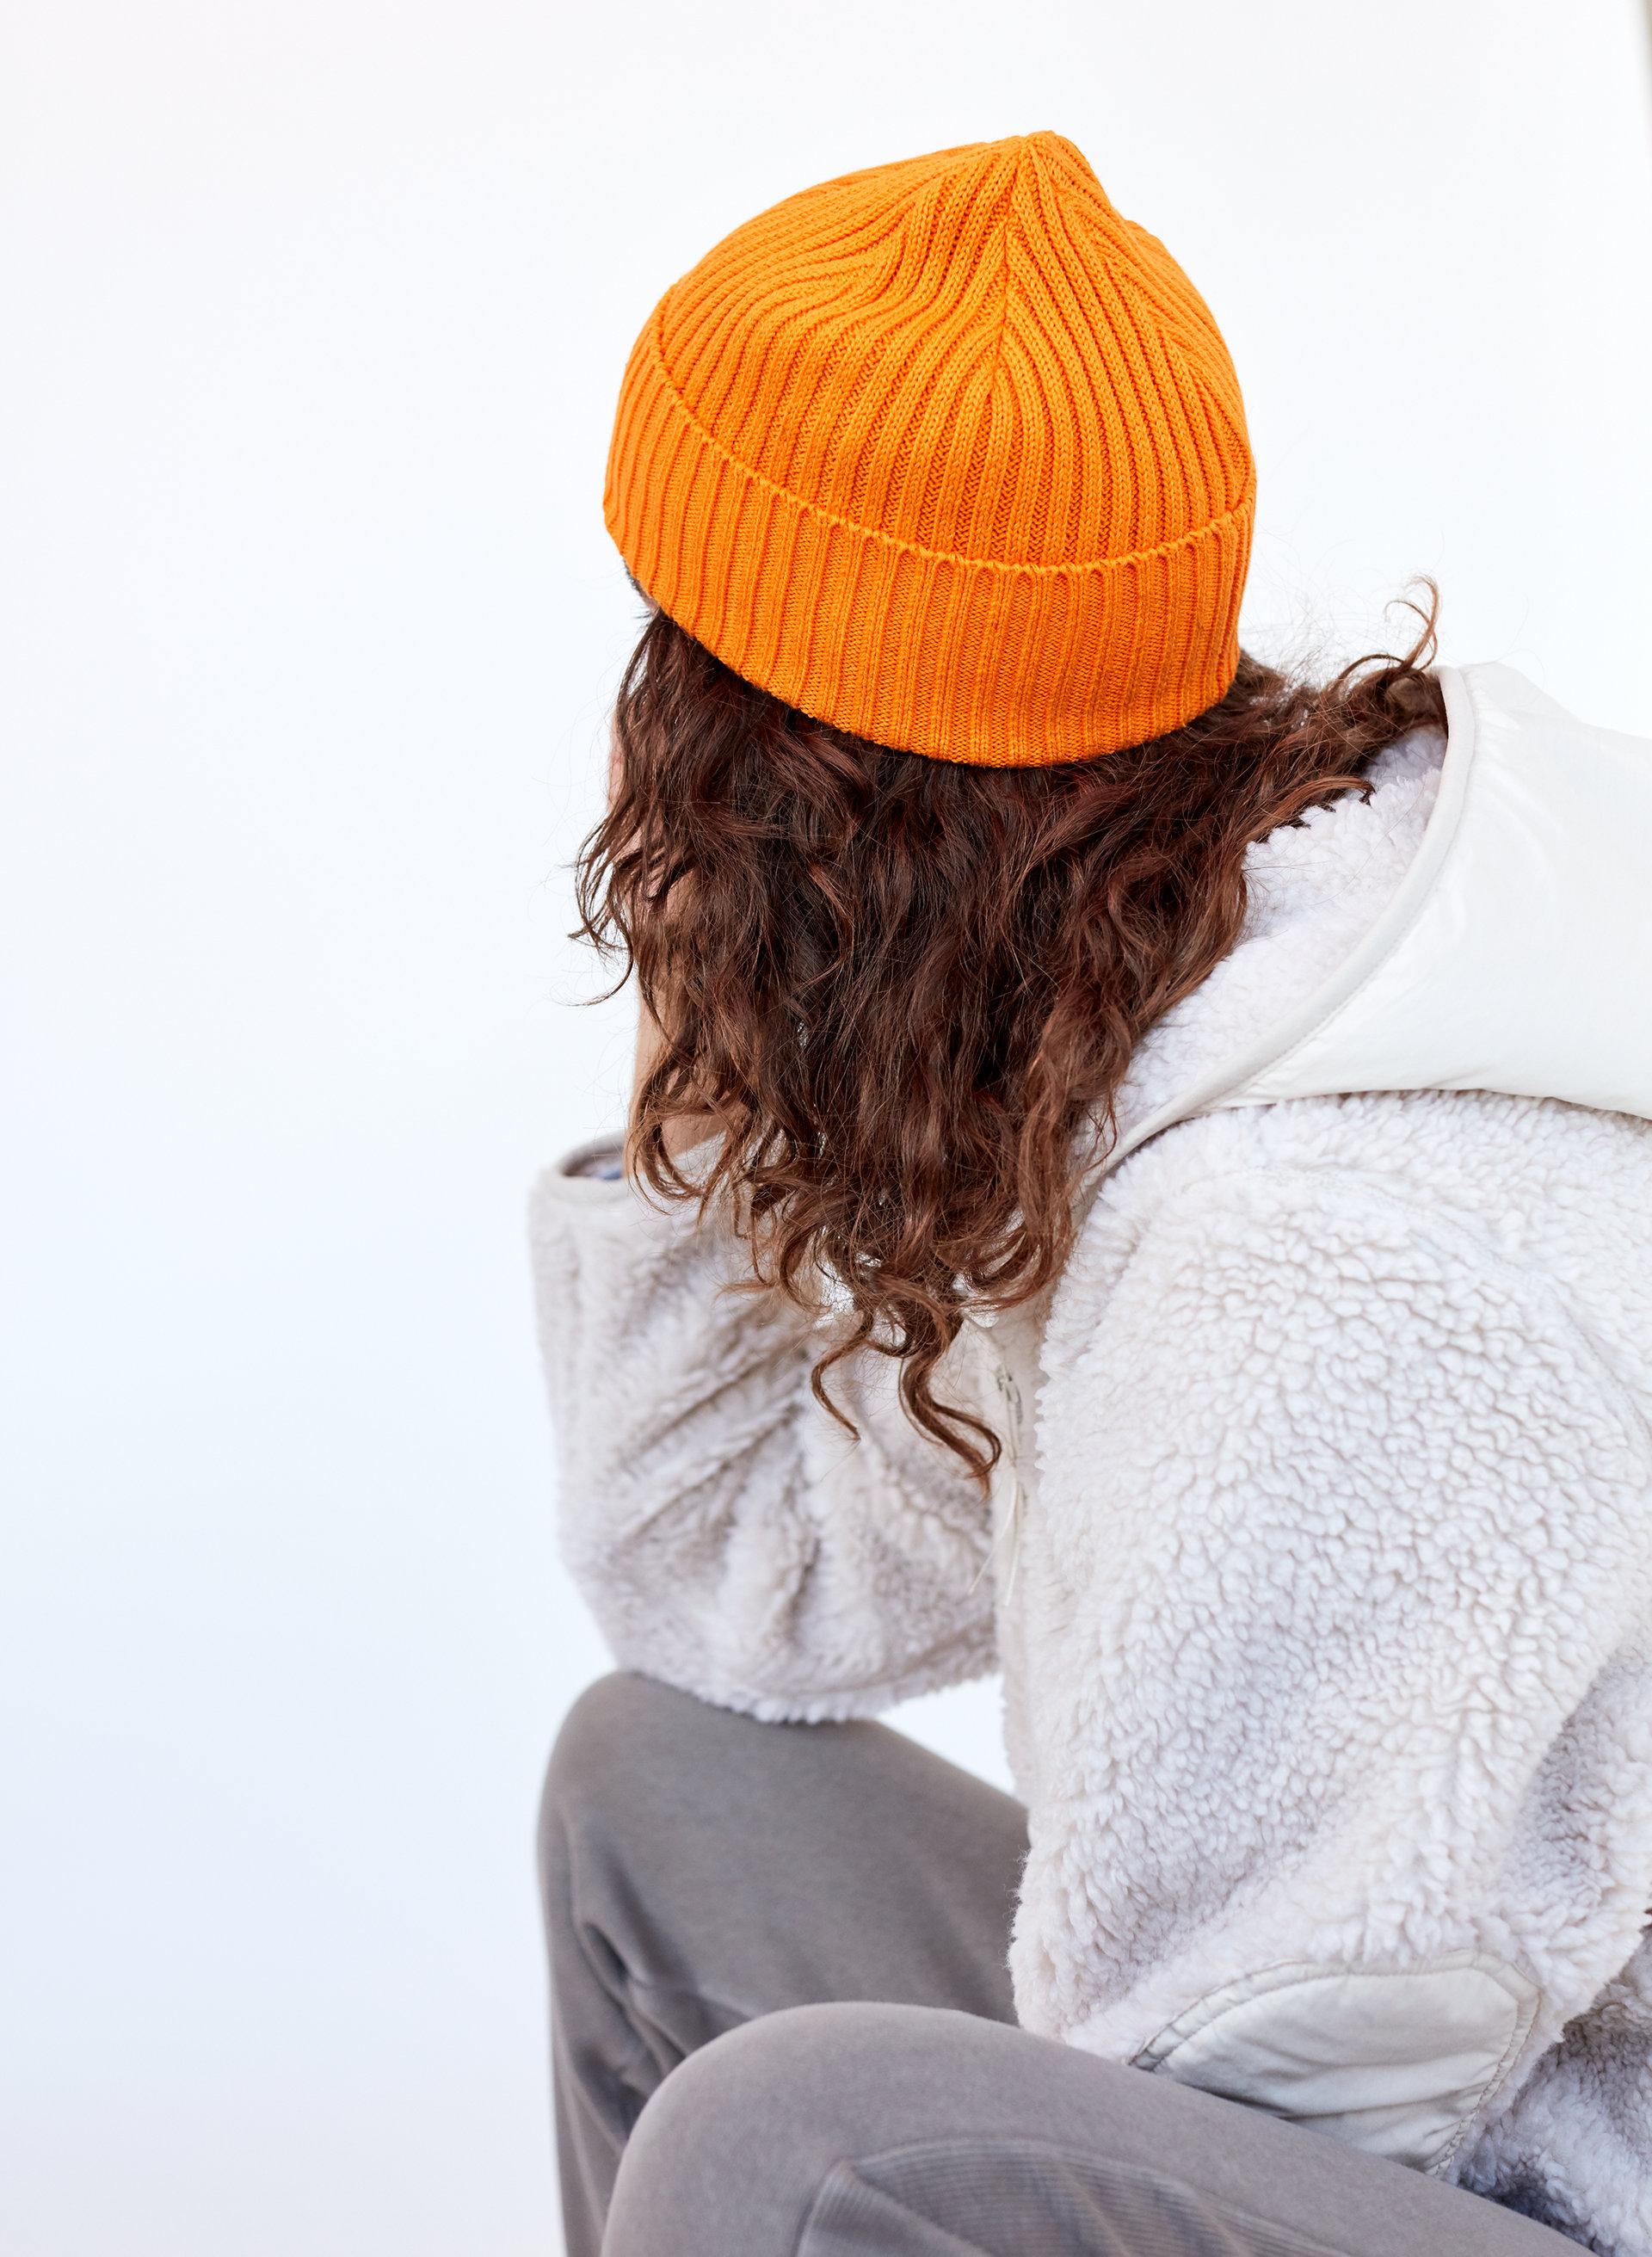 78355a691a2bae ANDIE PEAK HAT - Ribbed, knit beanie